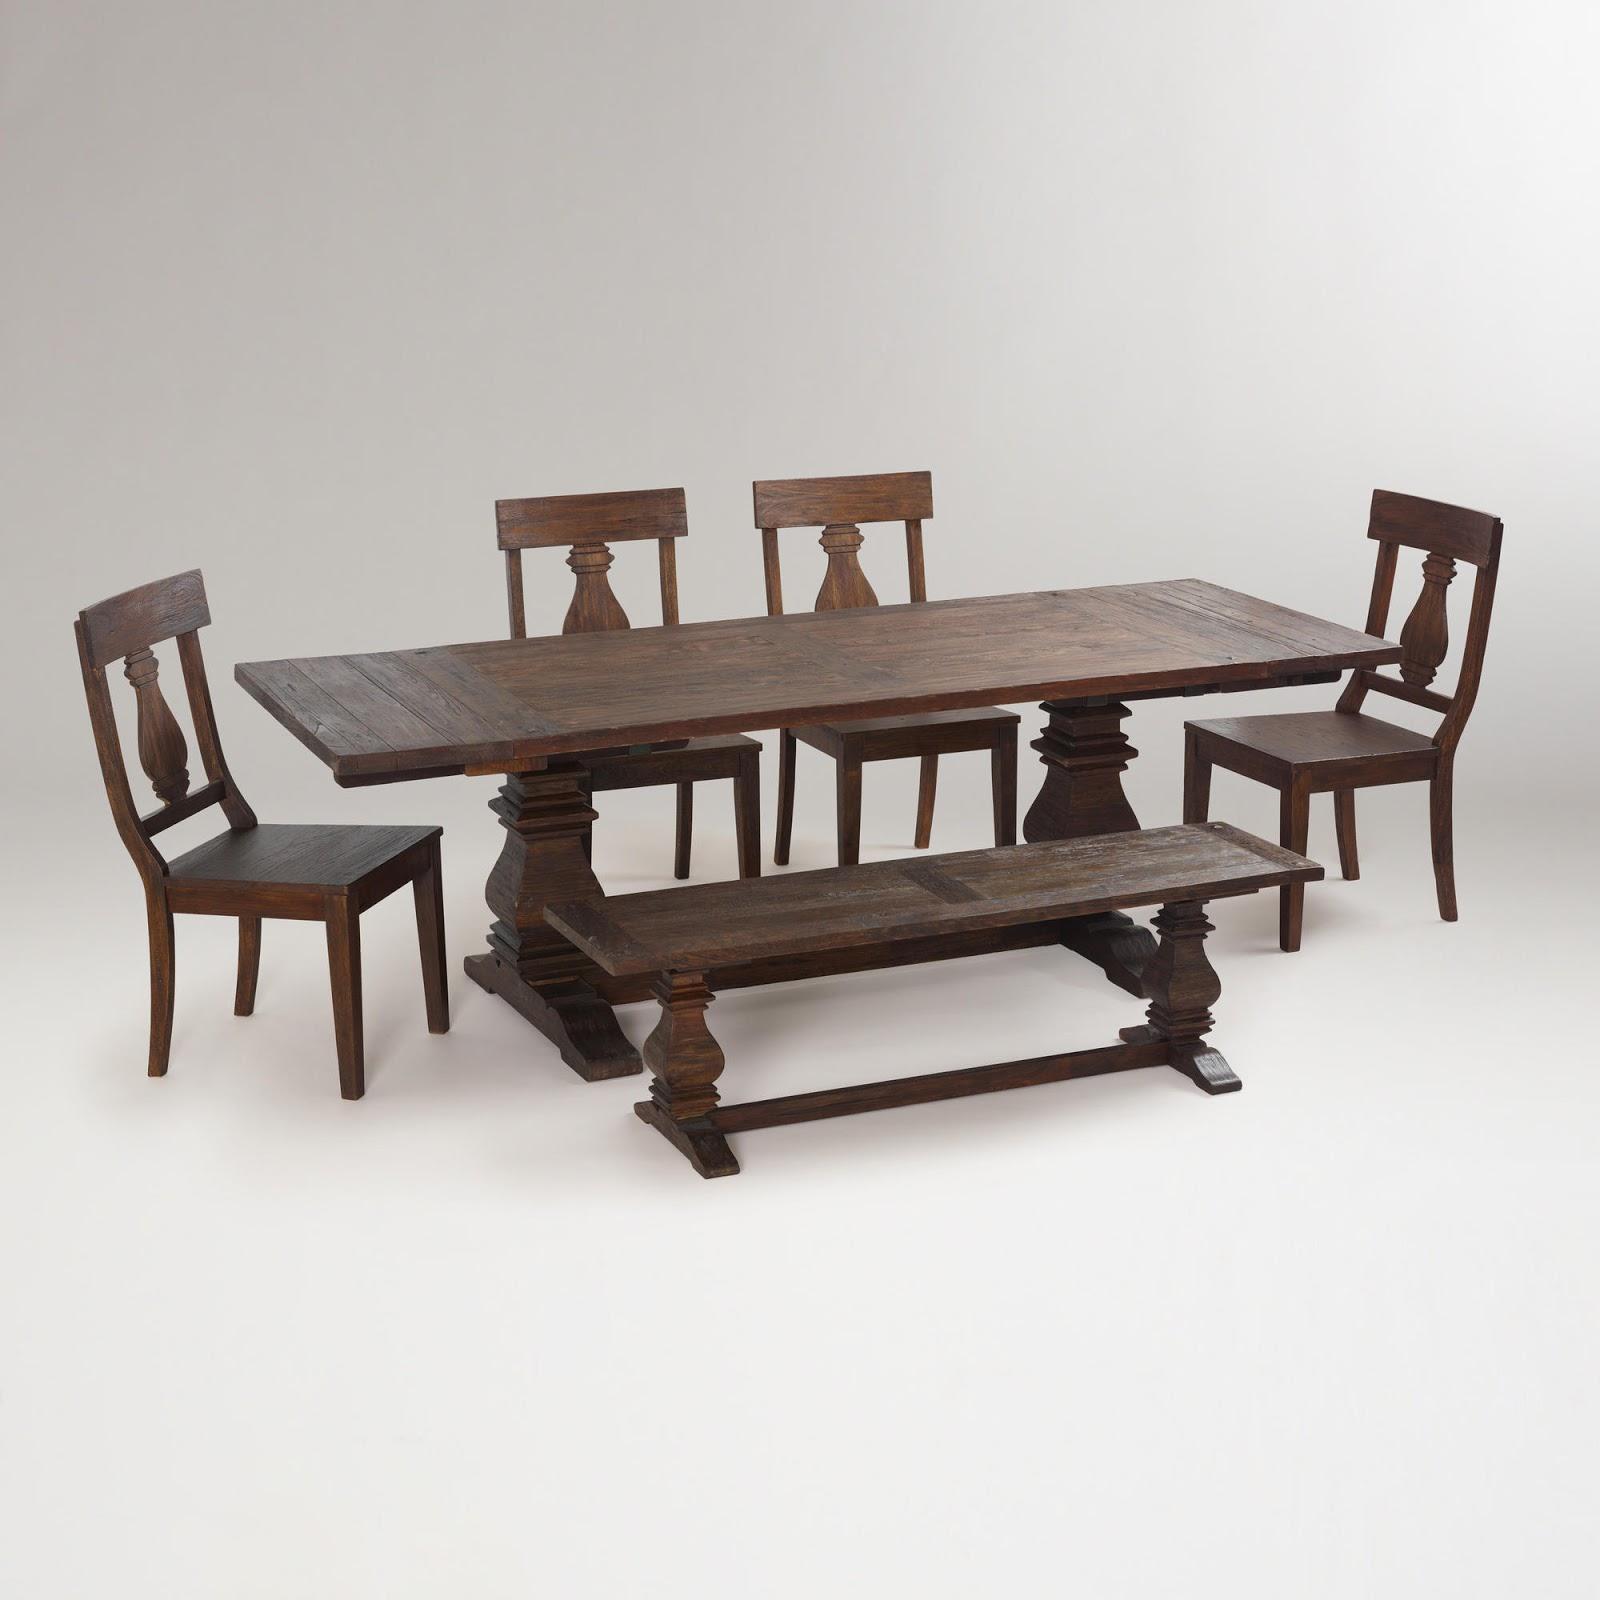 The Bradshaws Dining Table